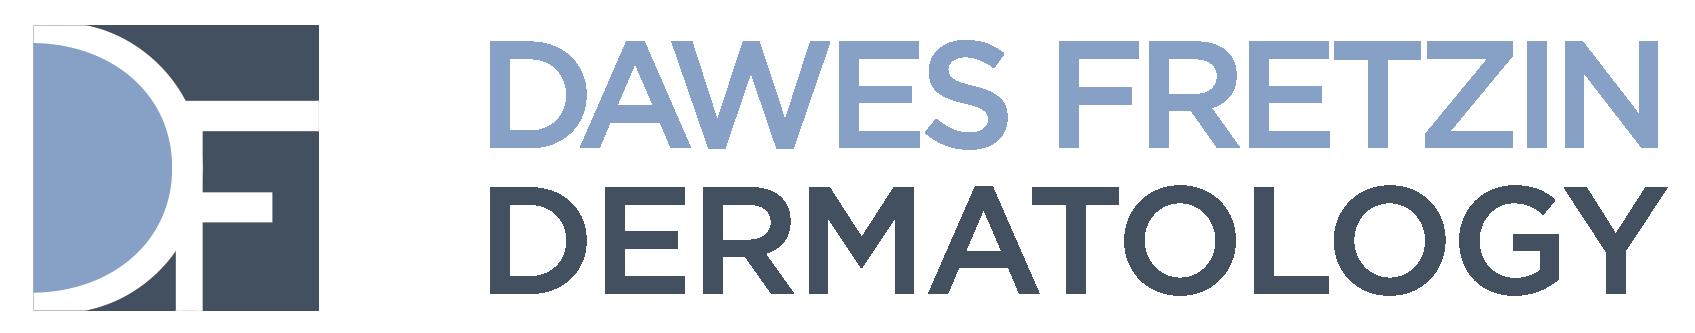 Dawes Fretzin Dermatology Company Logo